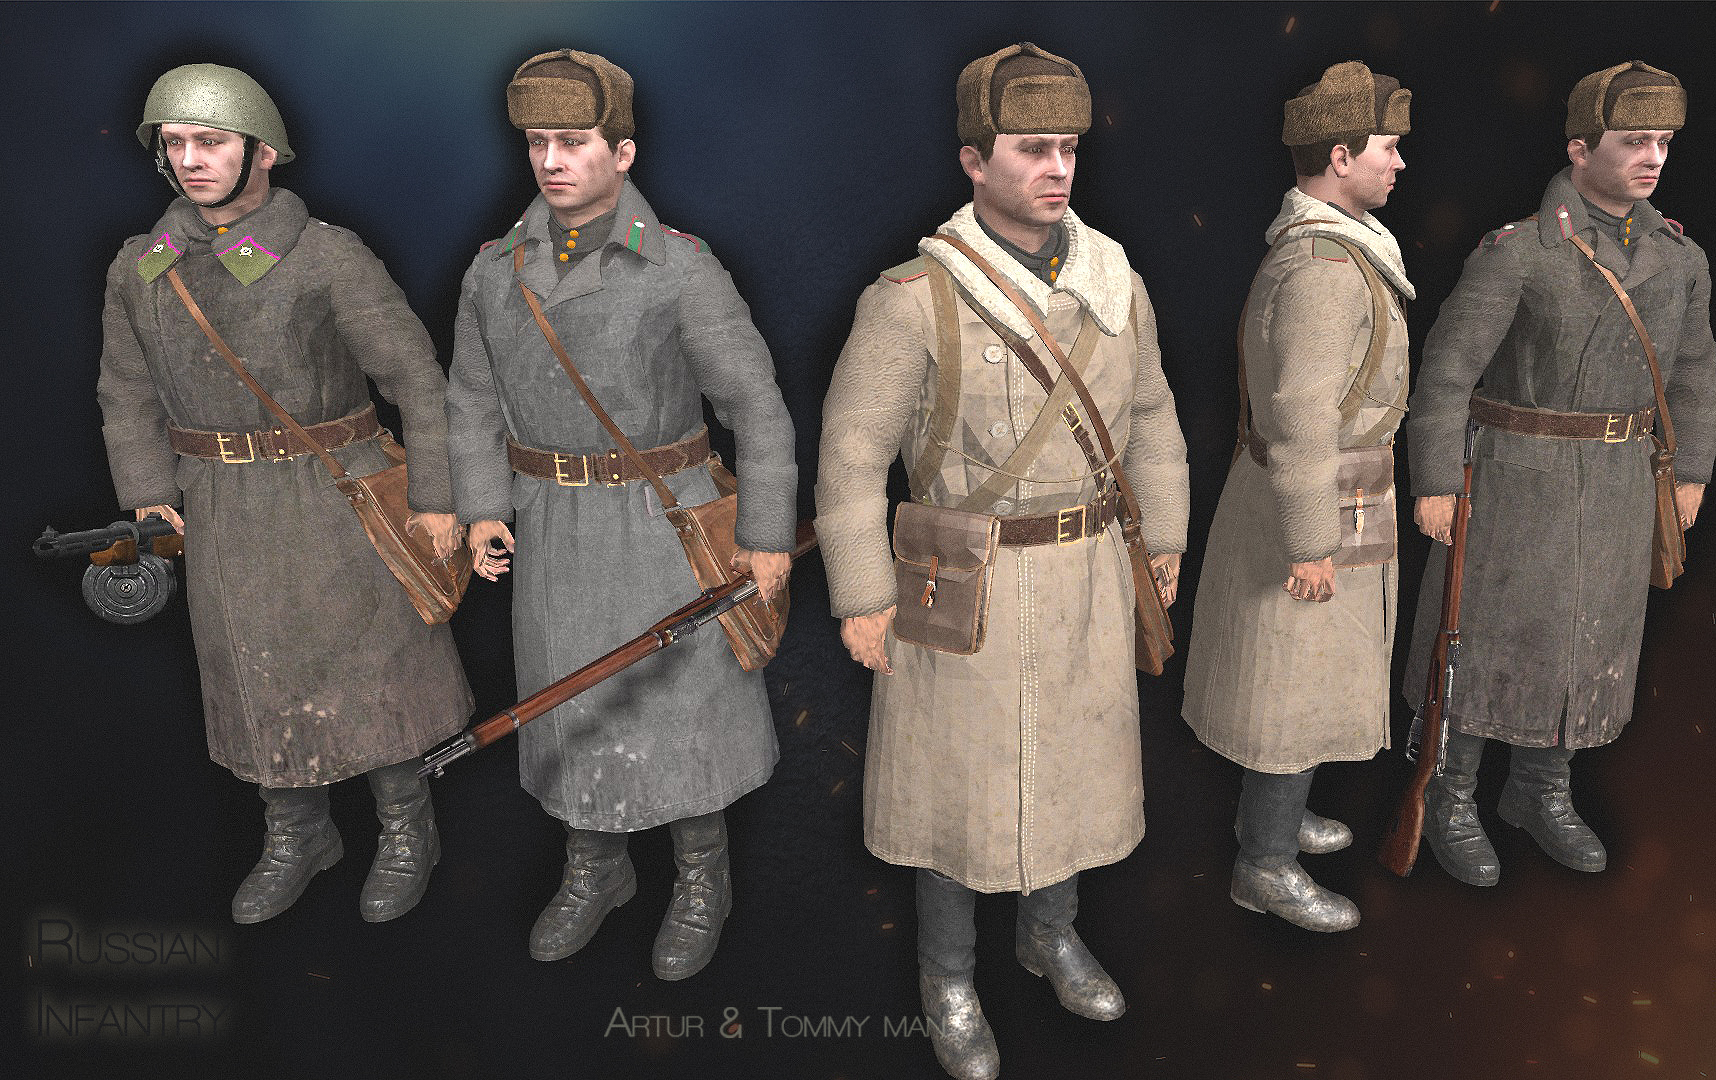 Oroszok budapest,1944-45 jatek ostrom